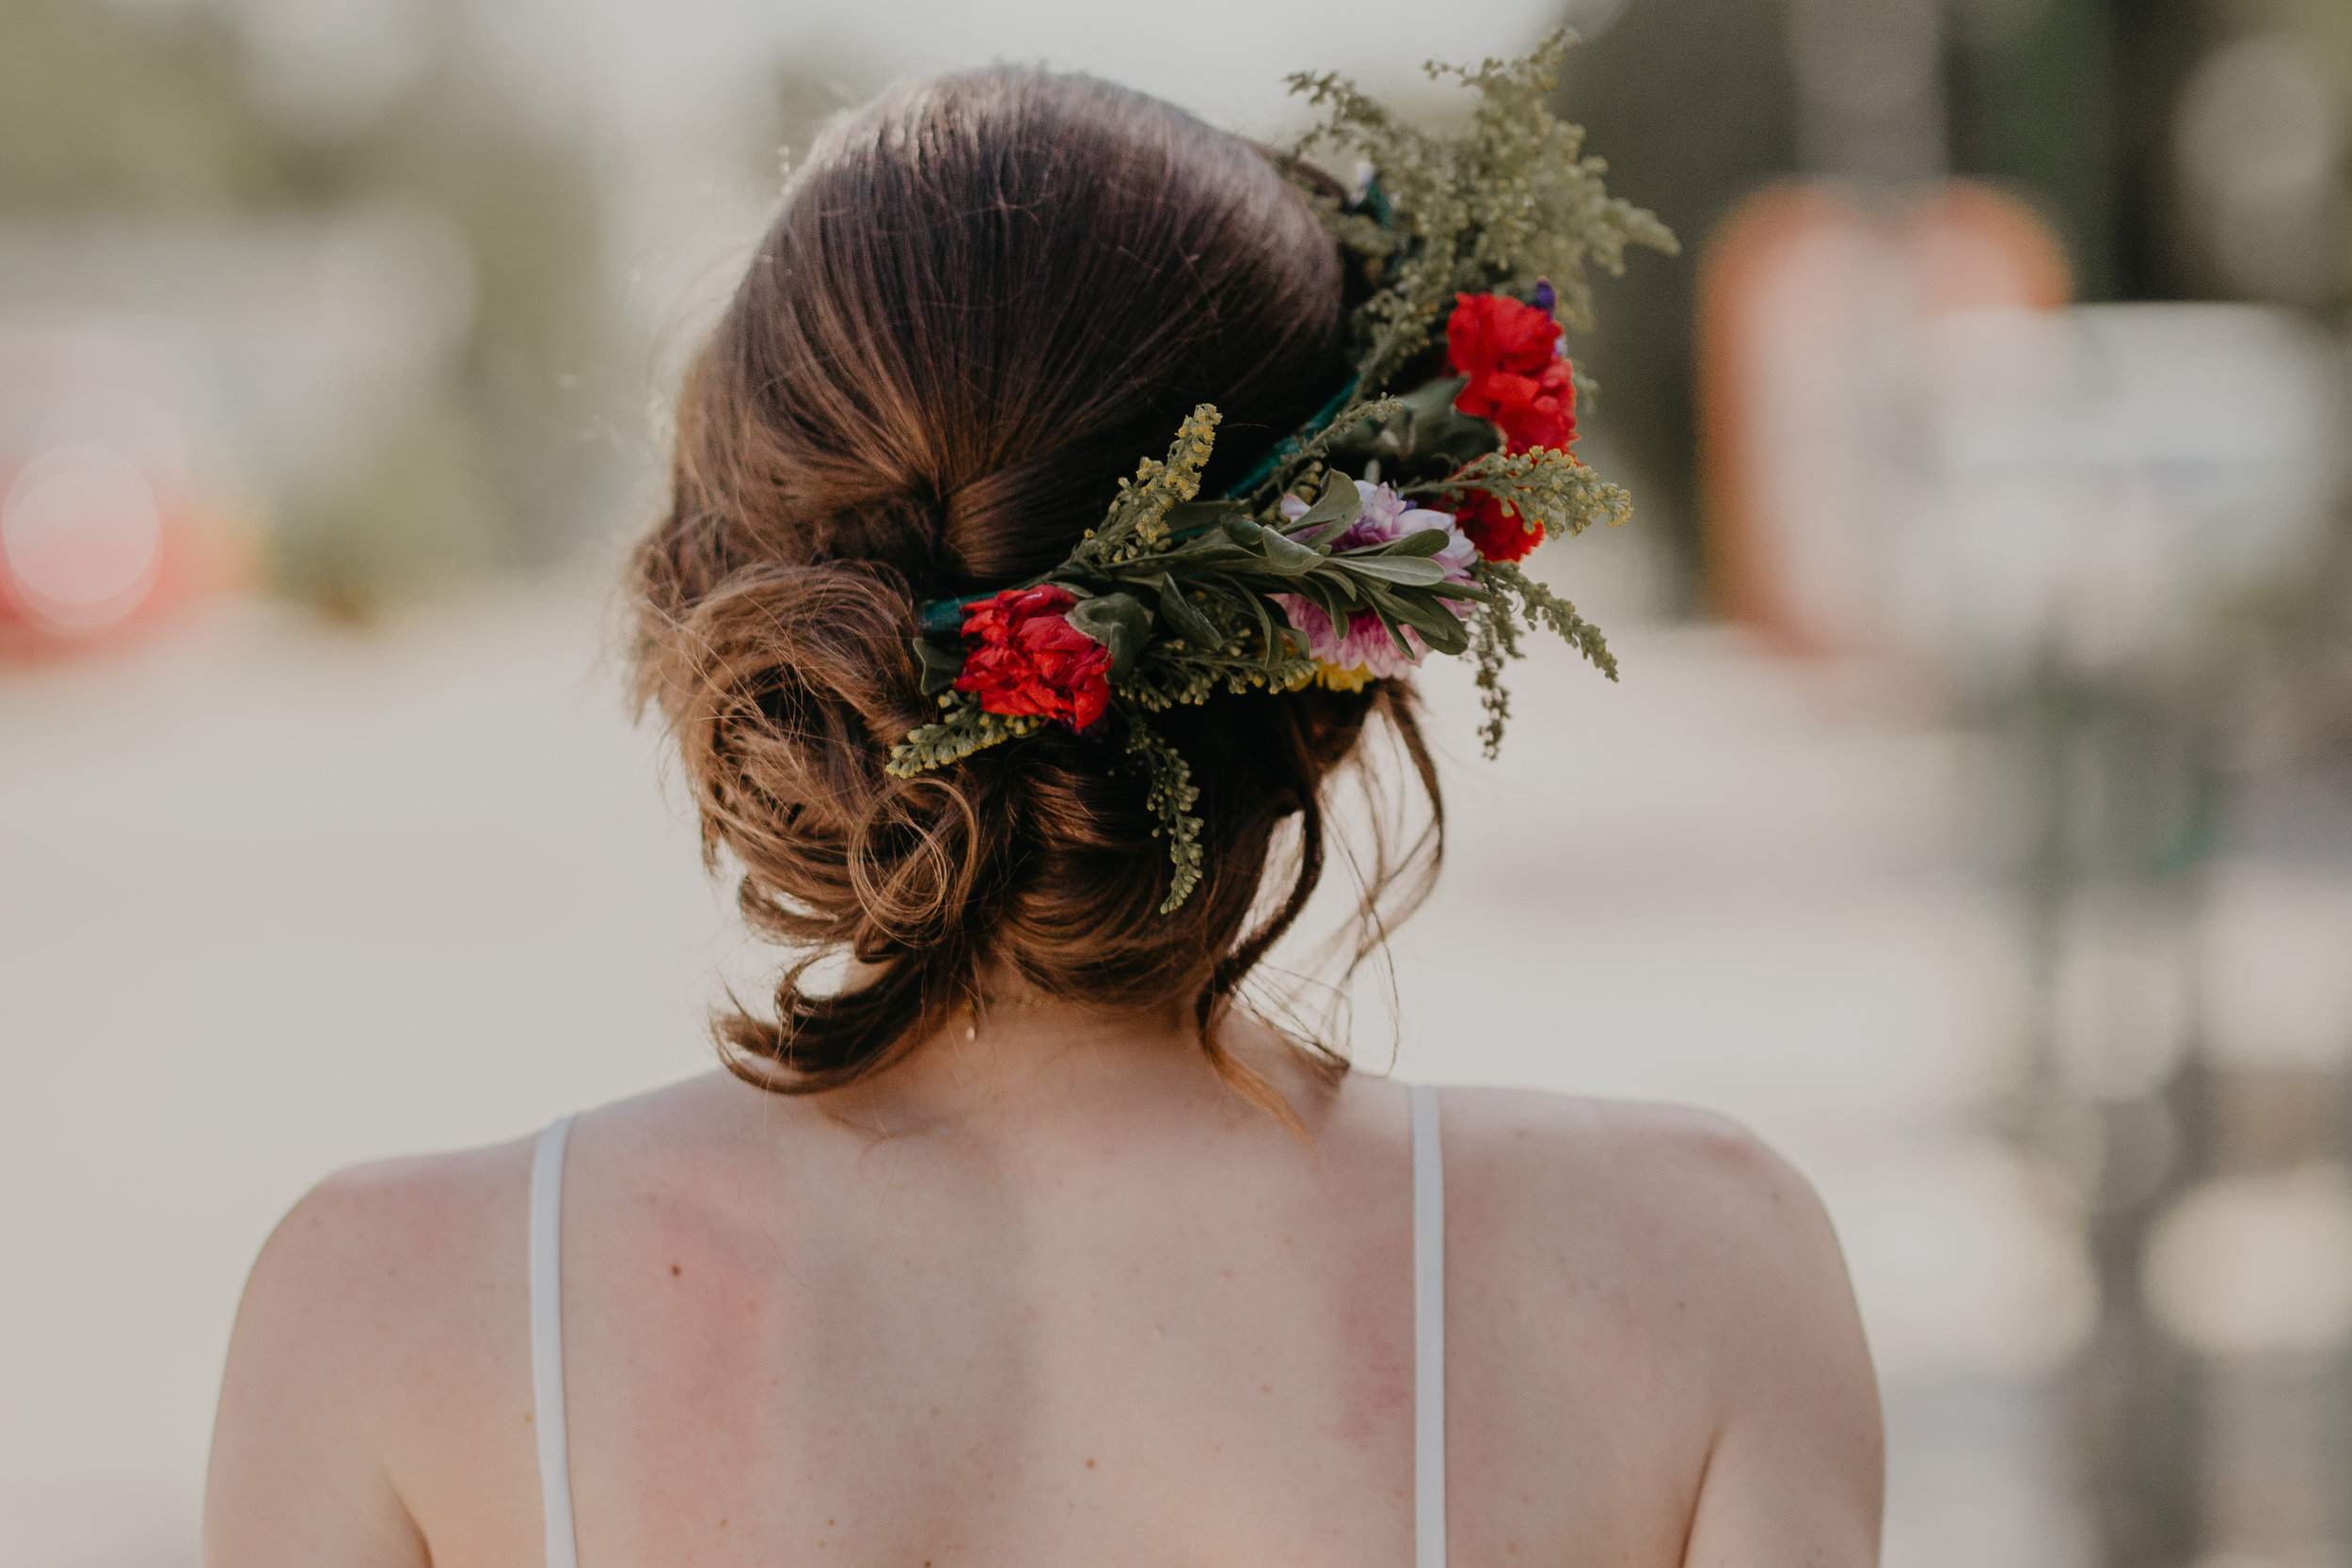 Nicole-Daacke-Photography-beachfront-akumal-destionation-wedding-tulum-mexico-elopement-photographer-destination-wedding-inspiration-sunset-champagne-pop-boho-bride-ocean-tropical-bohemian-tulum-wedding-photos-128.jpg